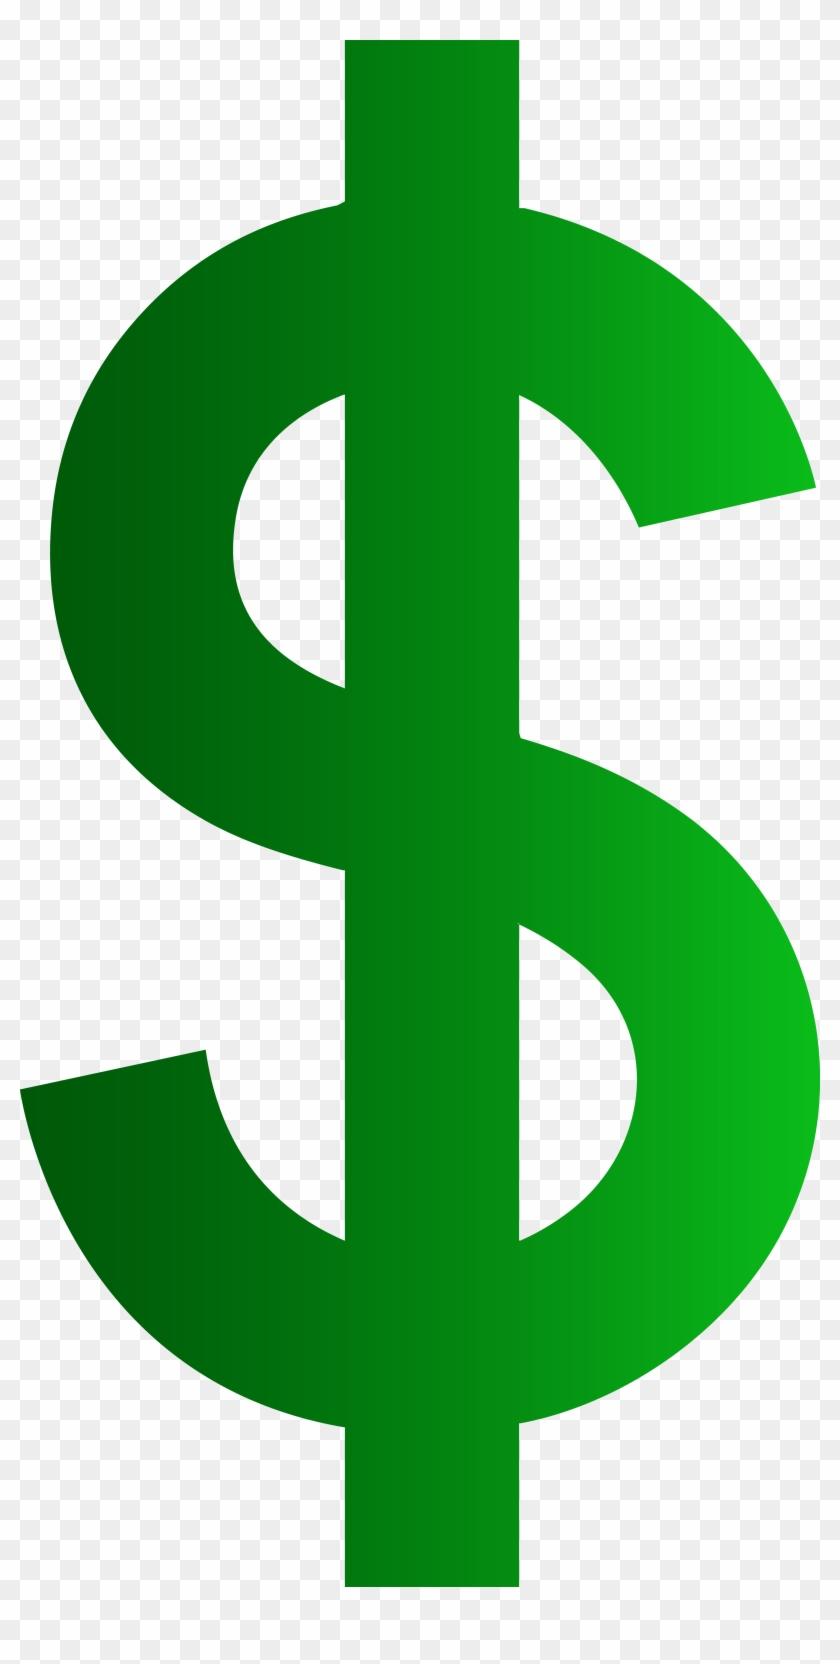 medium resolution of dollar money clipart dollar sign no background 824481